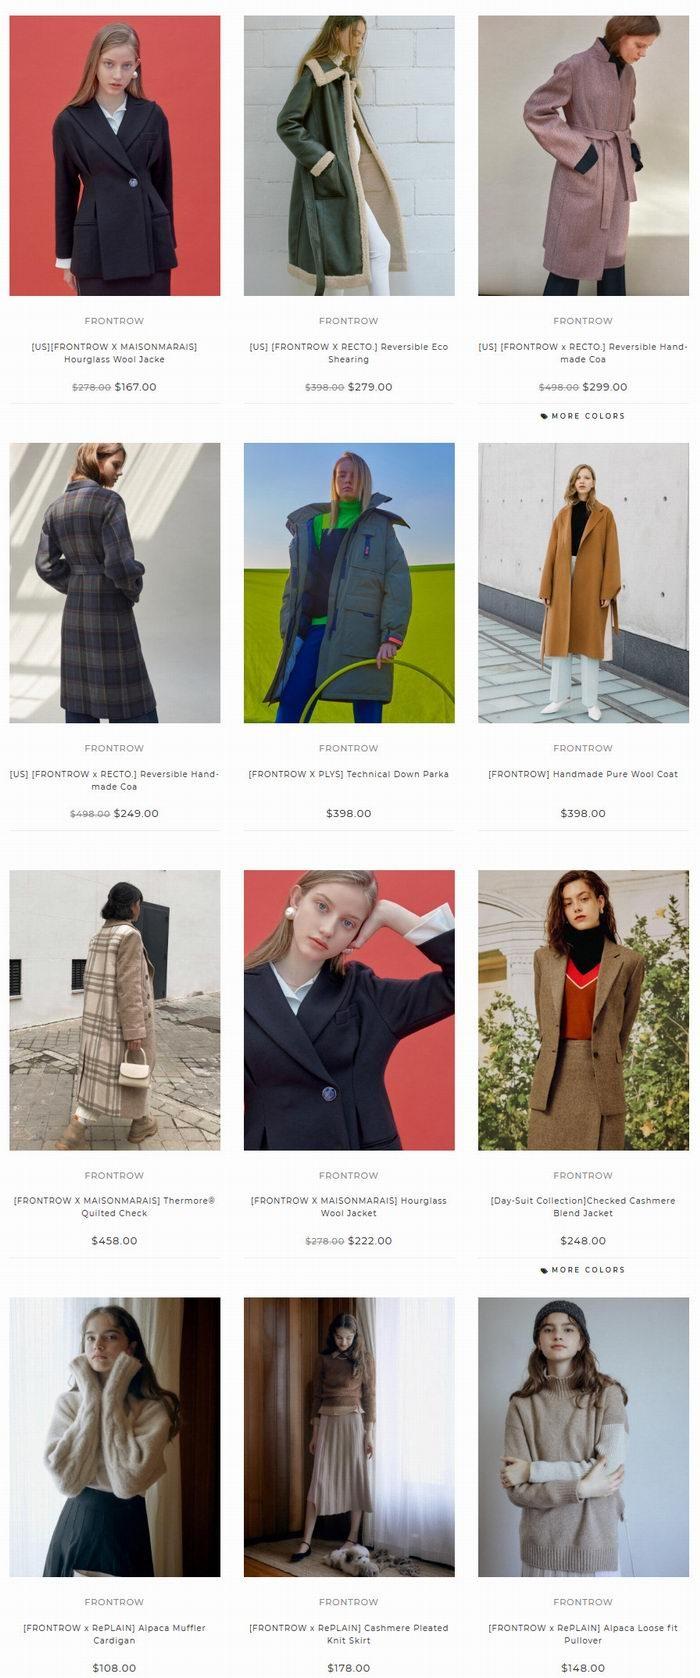 W Concept 超人气品牌 3.7折起+额外8.5折优惠!最受韩国明星喜爱的网络购物平台!